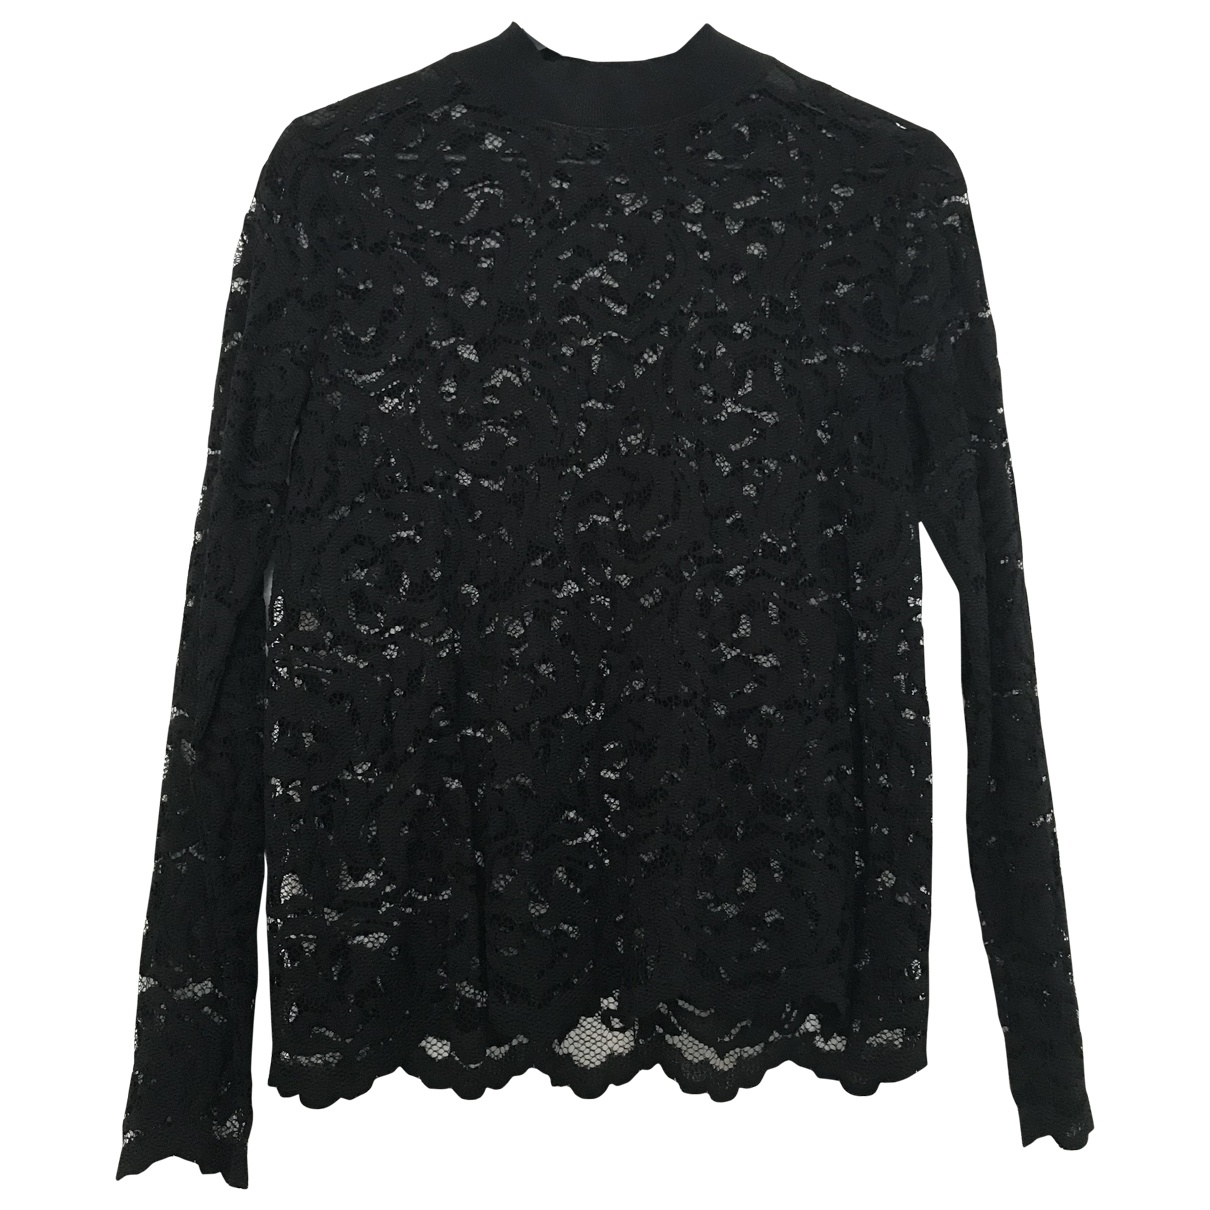 Samsoe & Samsoe - Top   pour femme en dentelle - noir